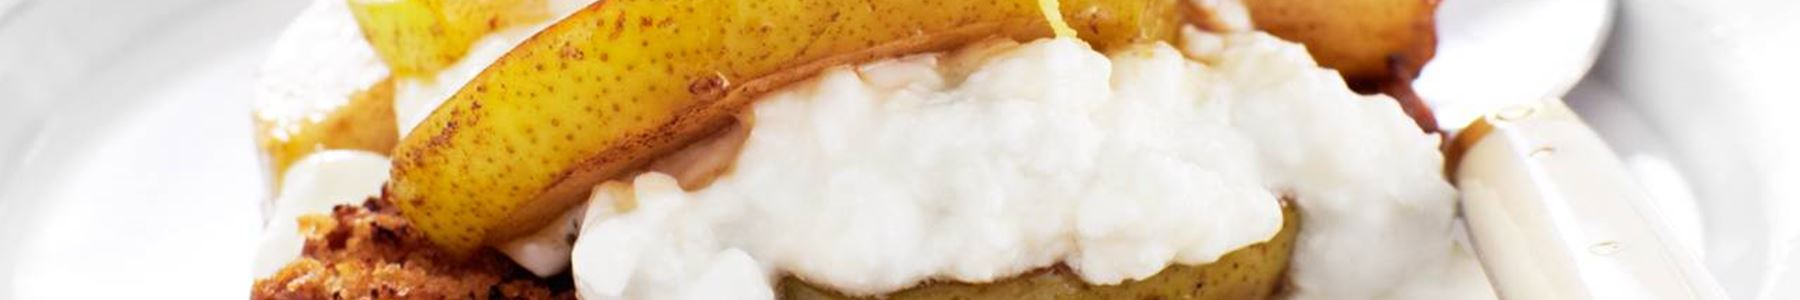 Snabb + Kalorisnål + Pepparkakor